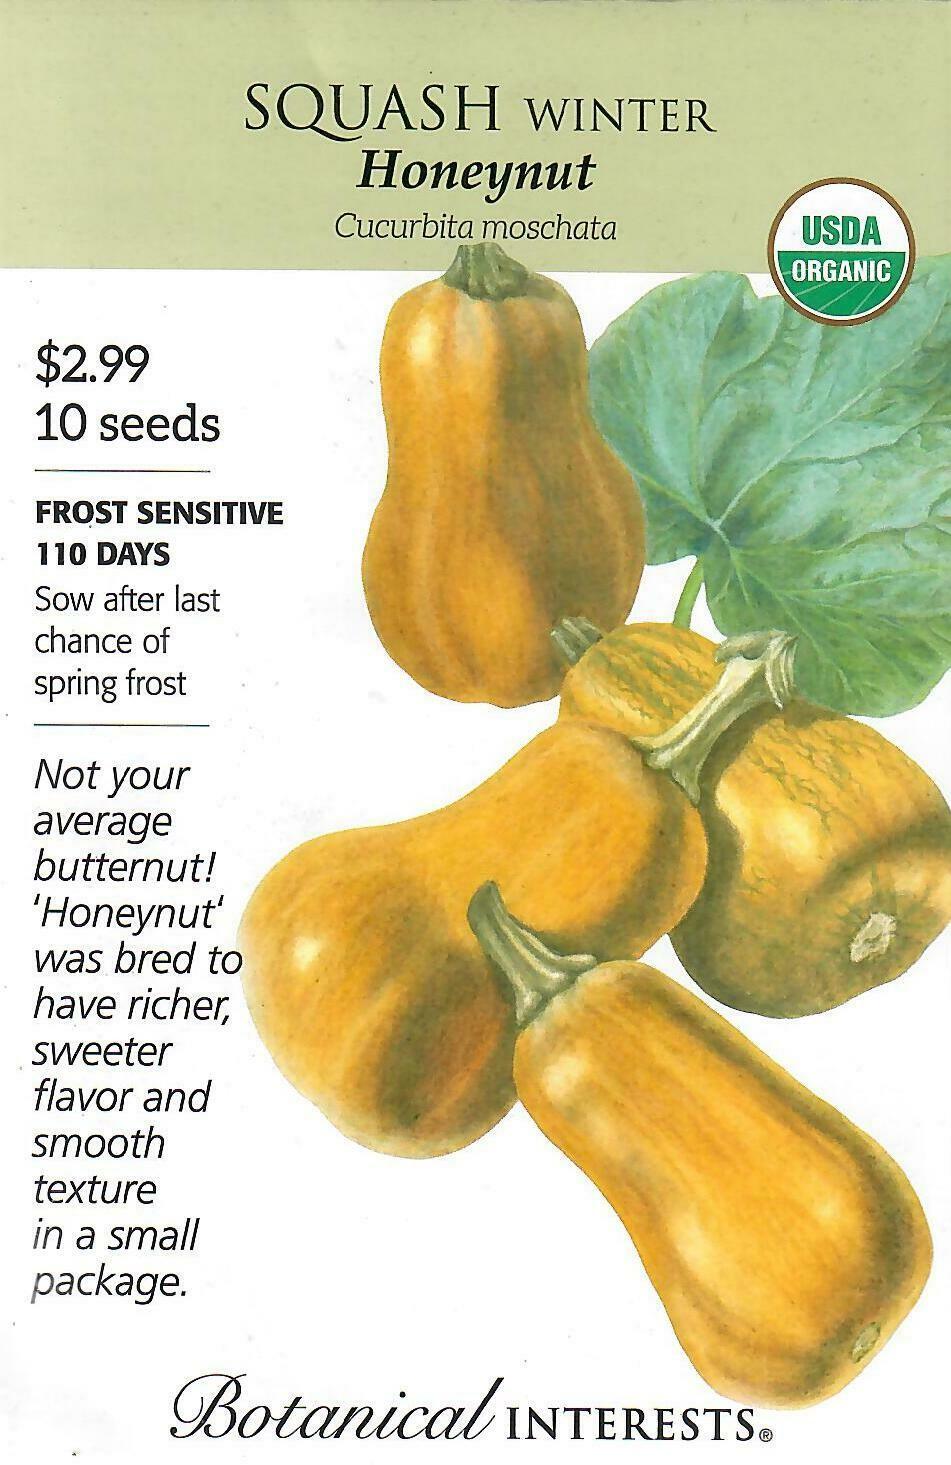 Squash Winter Honeynut Org Botanical Interests